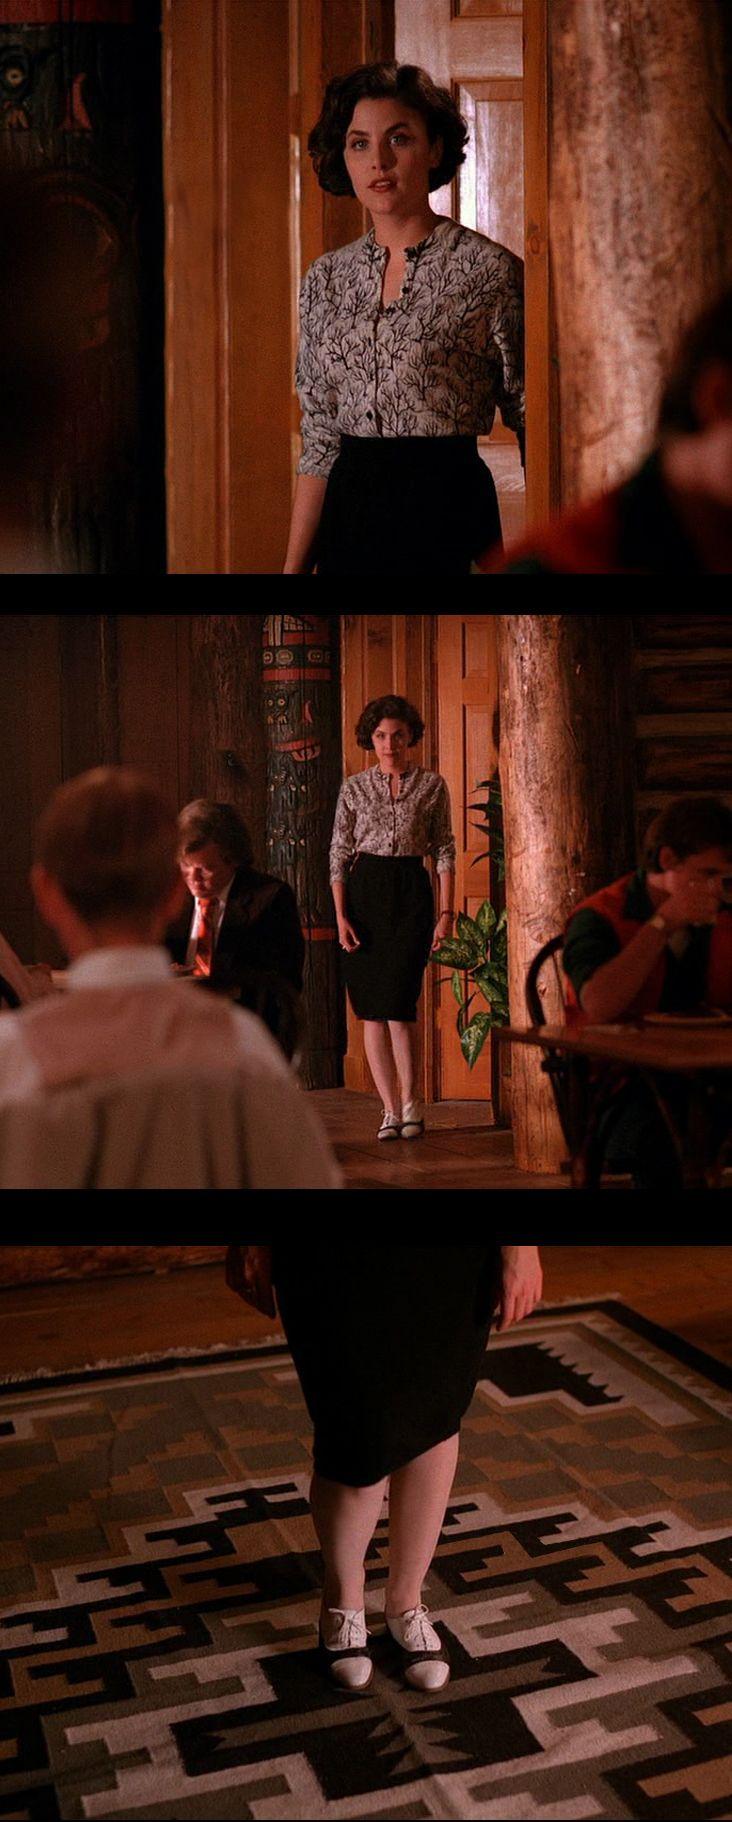 Audrey Horne in 'Twin Peaks' (1990). Costume Designer: Sara Markowitz